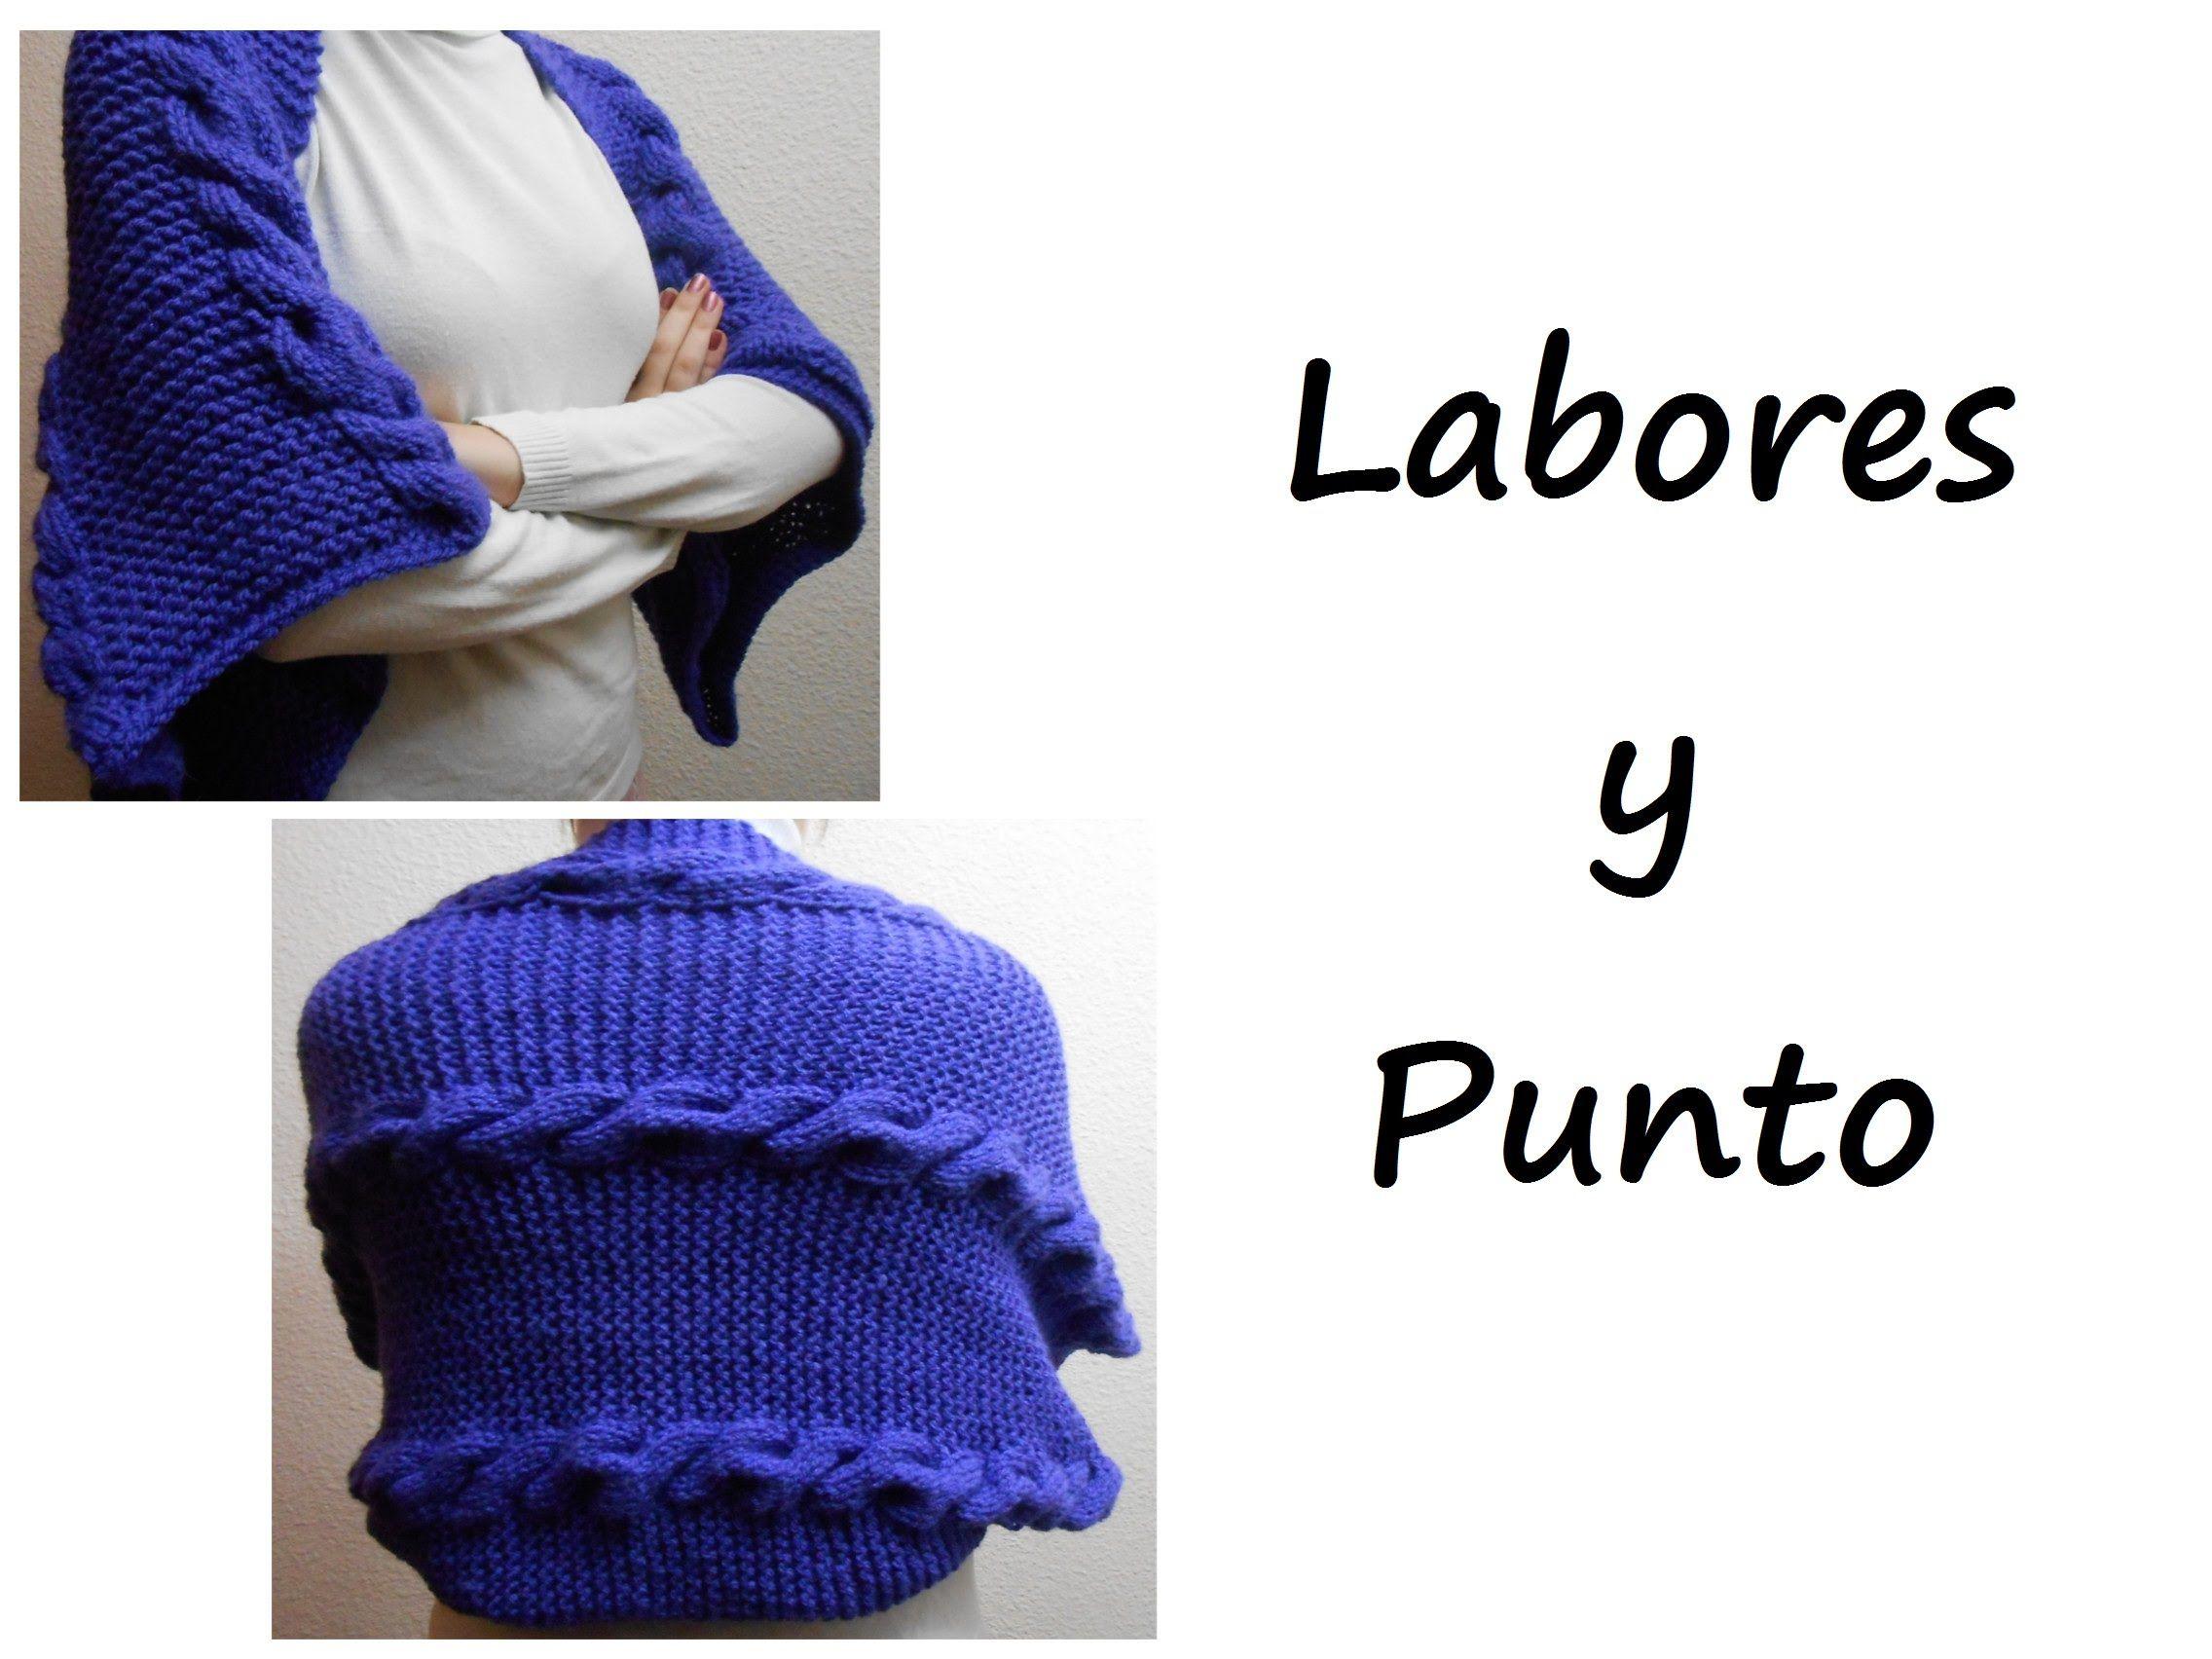 Aprende a tejer un chal con mangas en dos agujas | Etol,Bolero,Panço ...